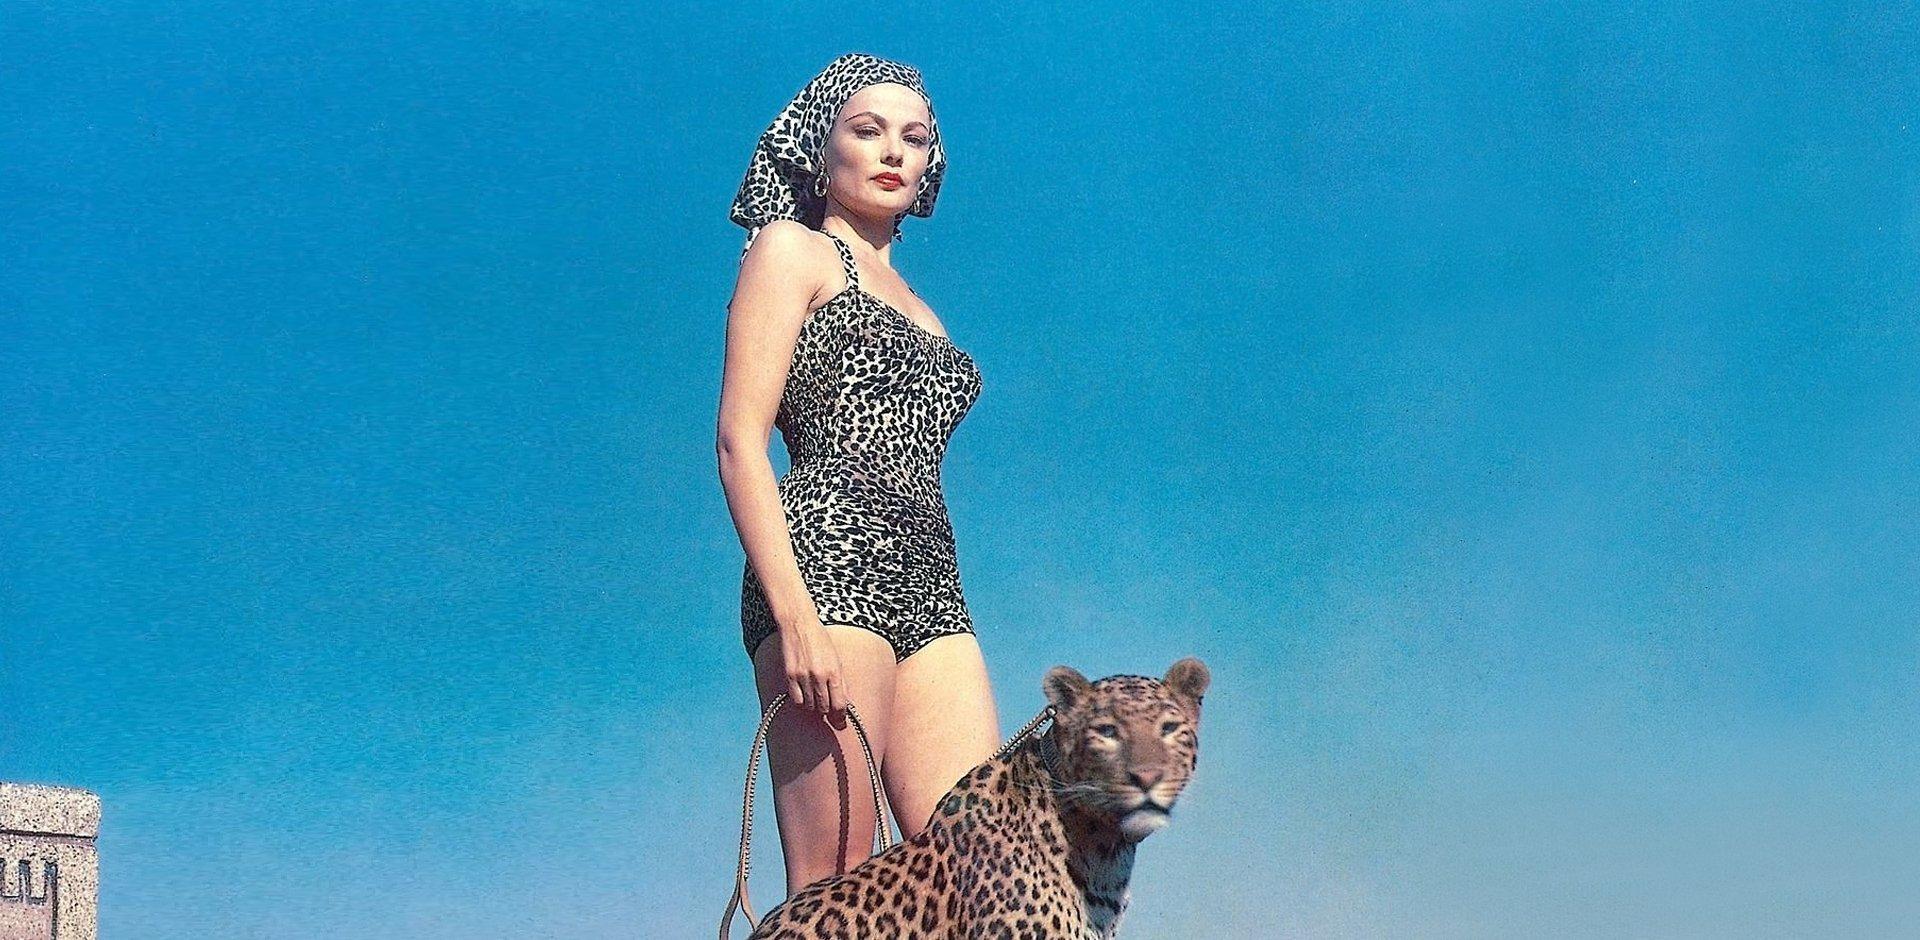 animalier, Gene Tierney